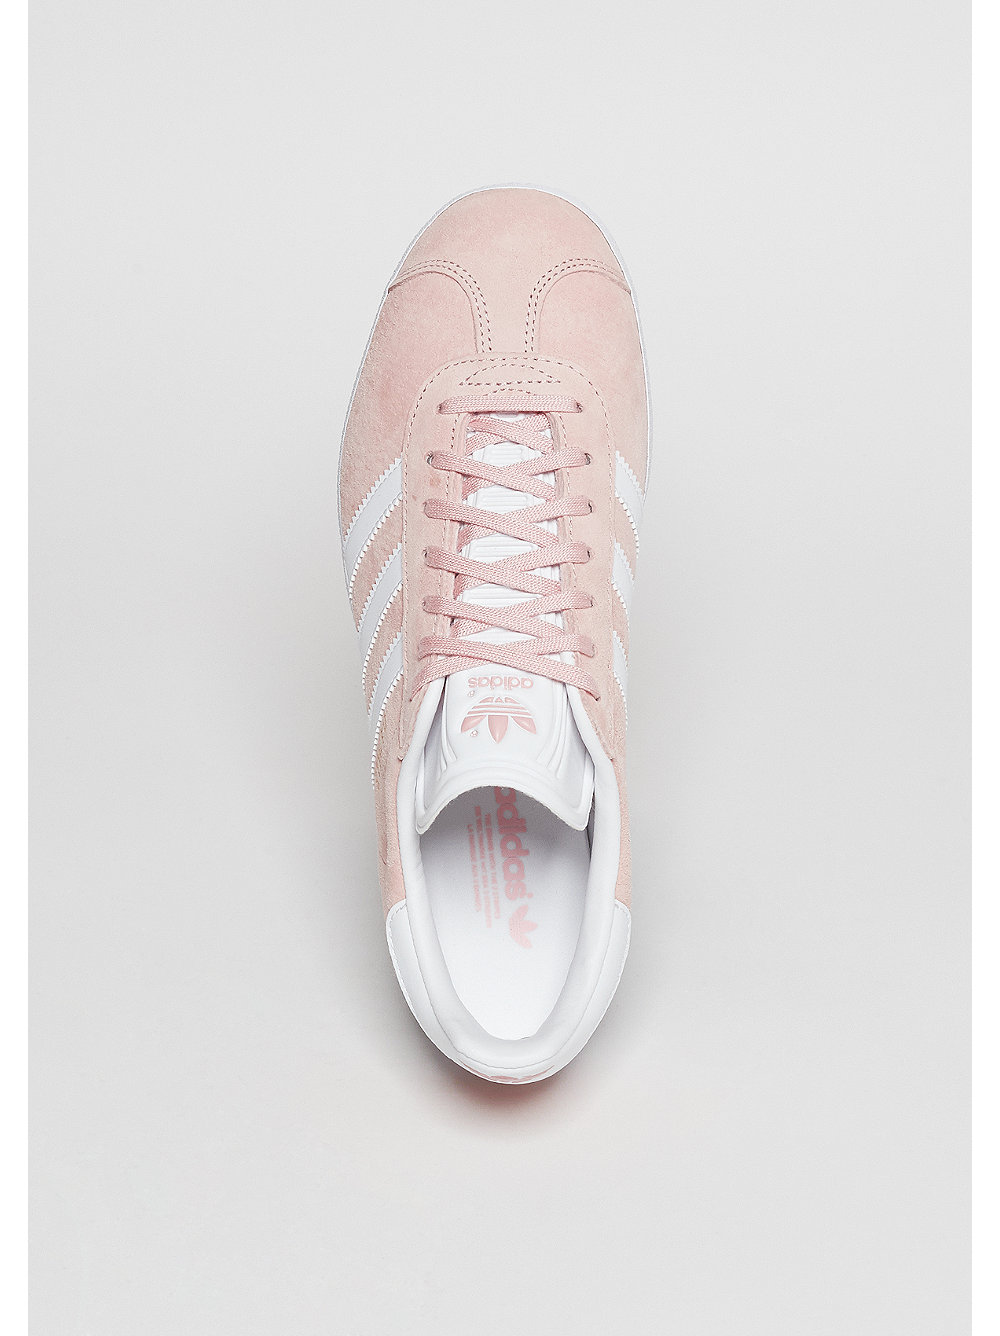 Commander adidas Gazelle vapour pinkwhitegold metallic